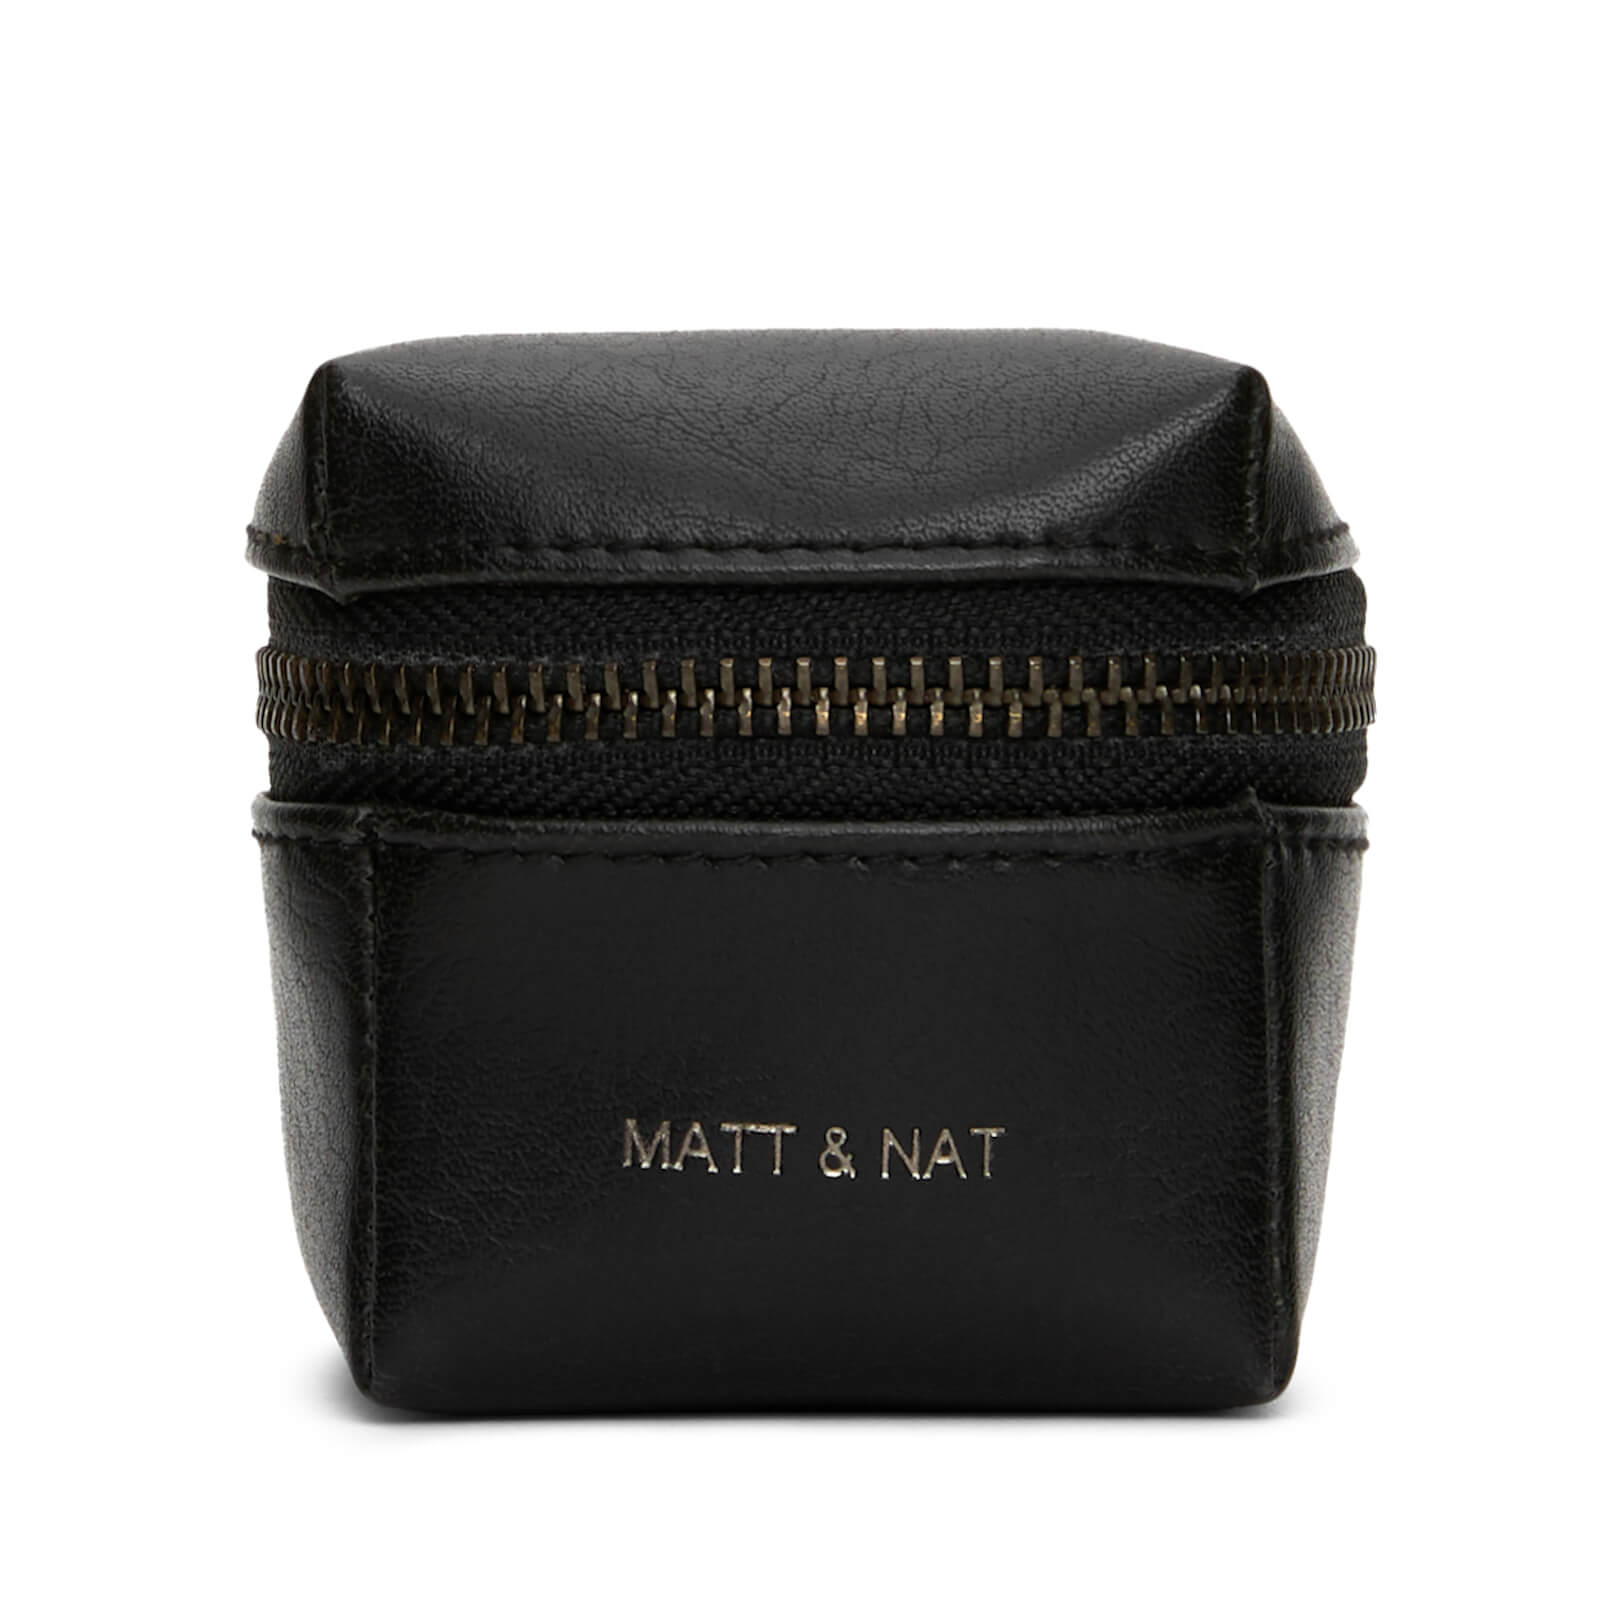 Matt & Nat Small Darling Jewellery Case - Black